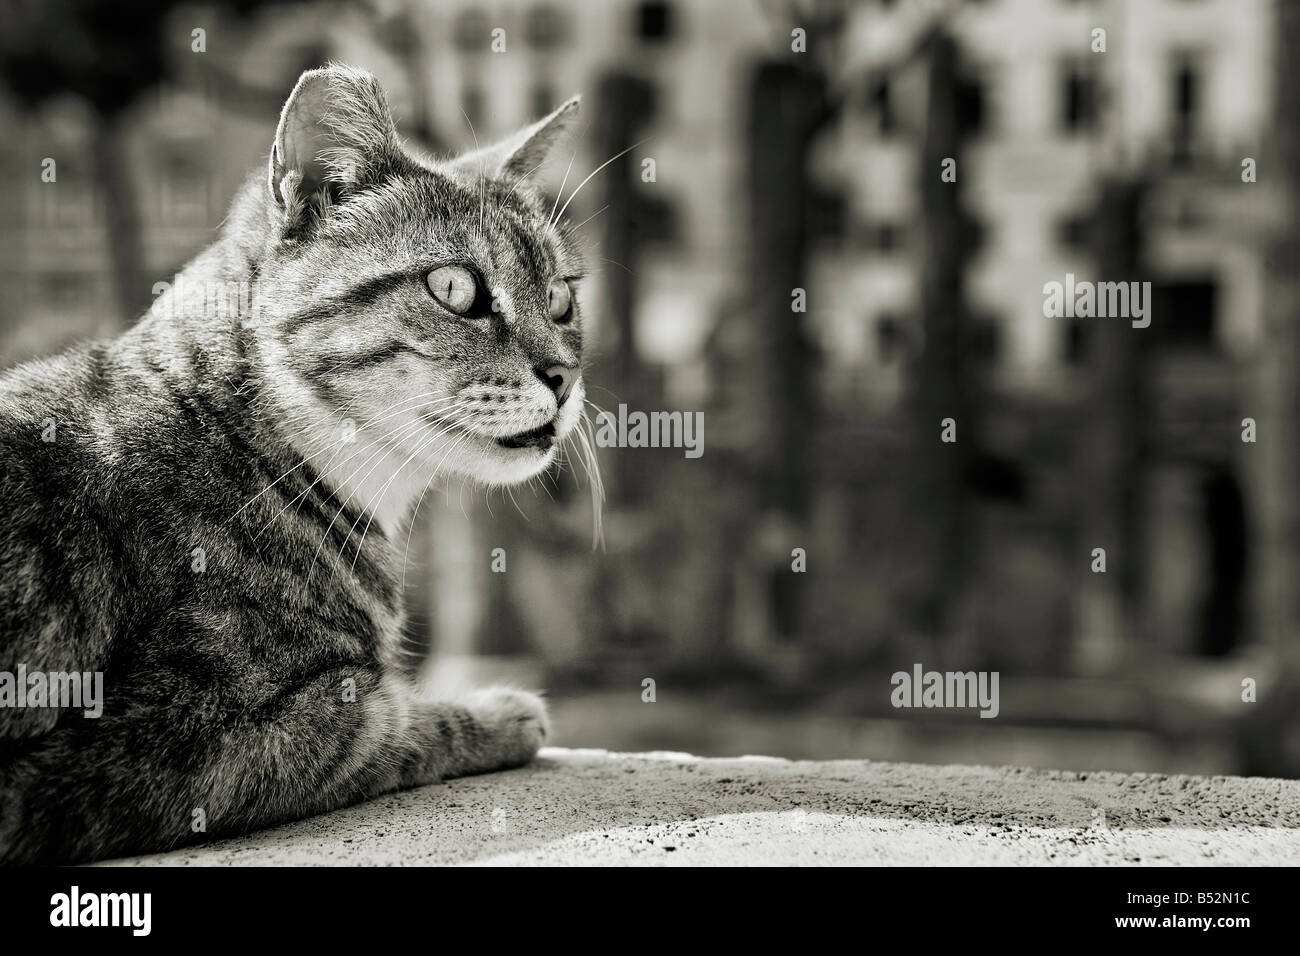 The Cat Empire Stockfotos & The Cat Empire Bilder - Alamy